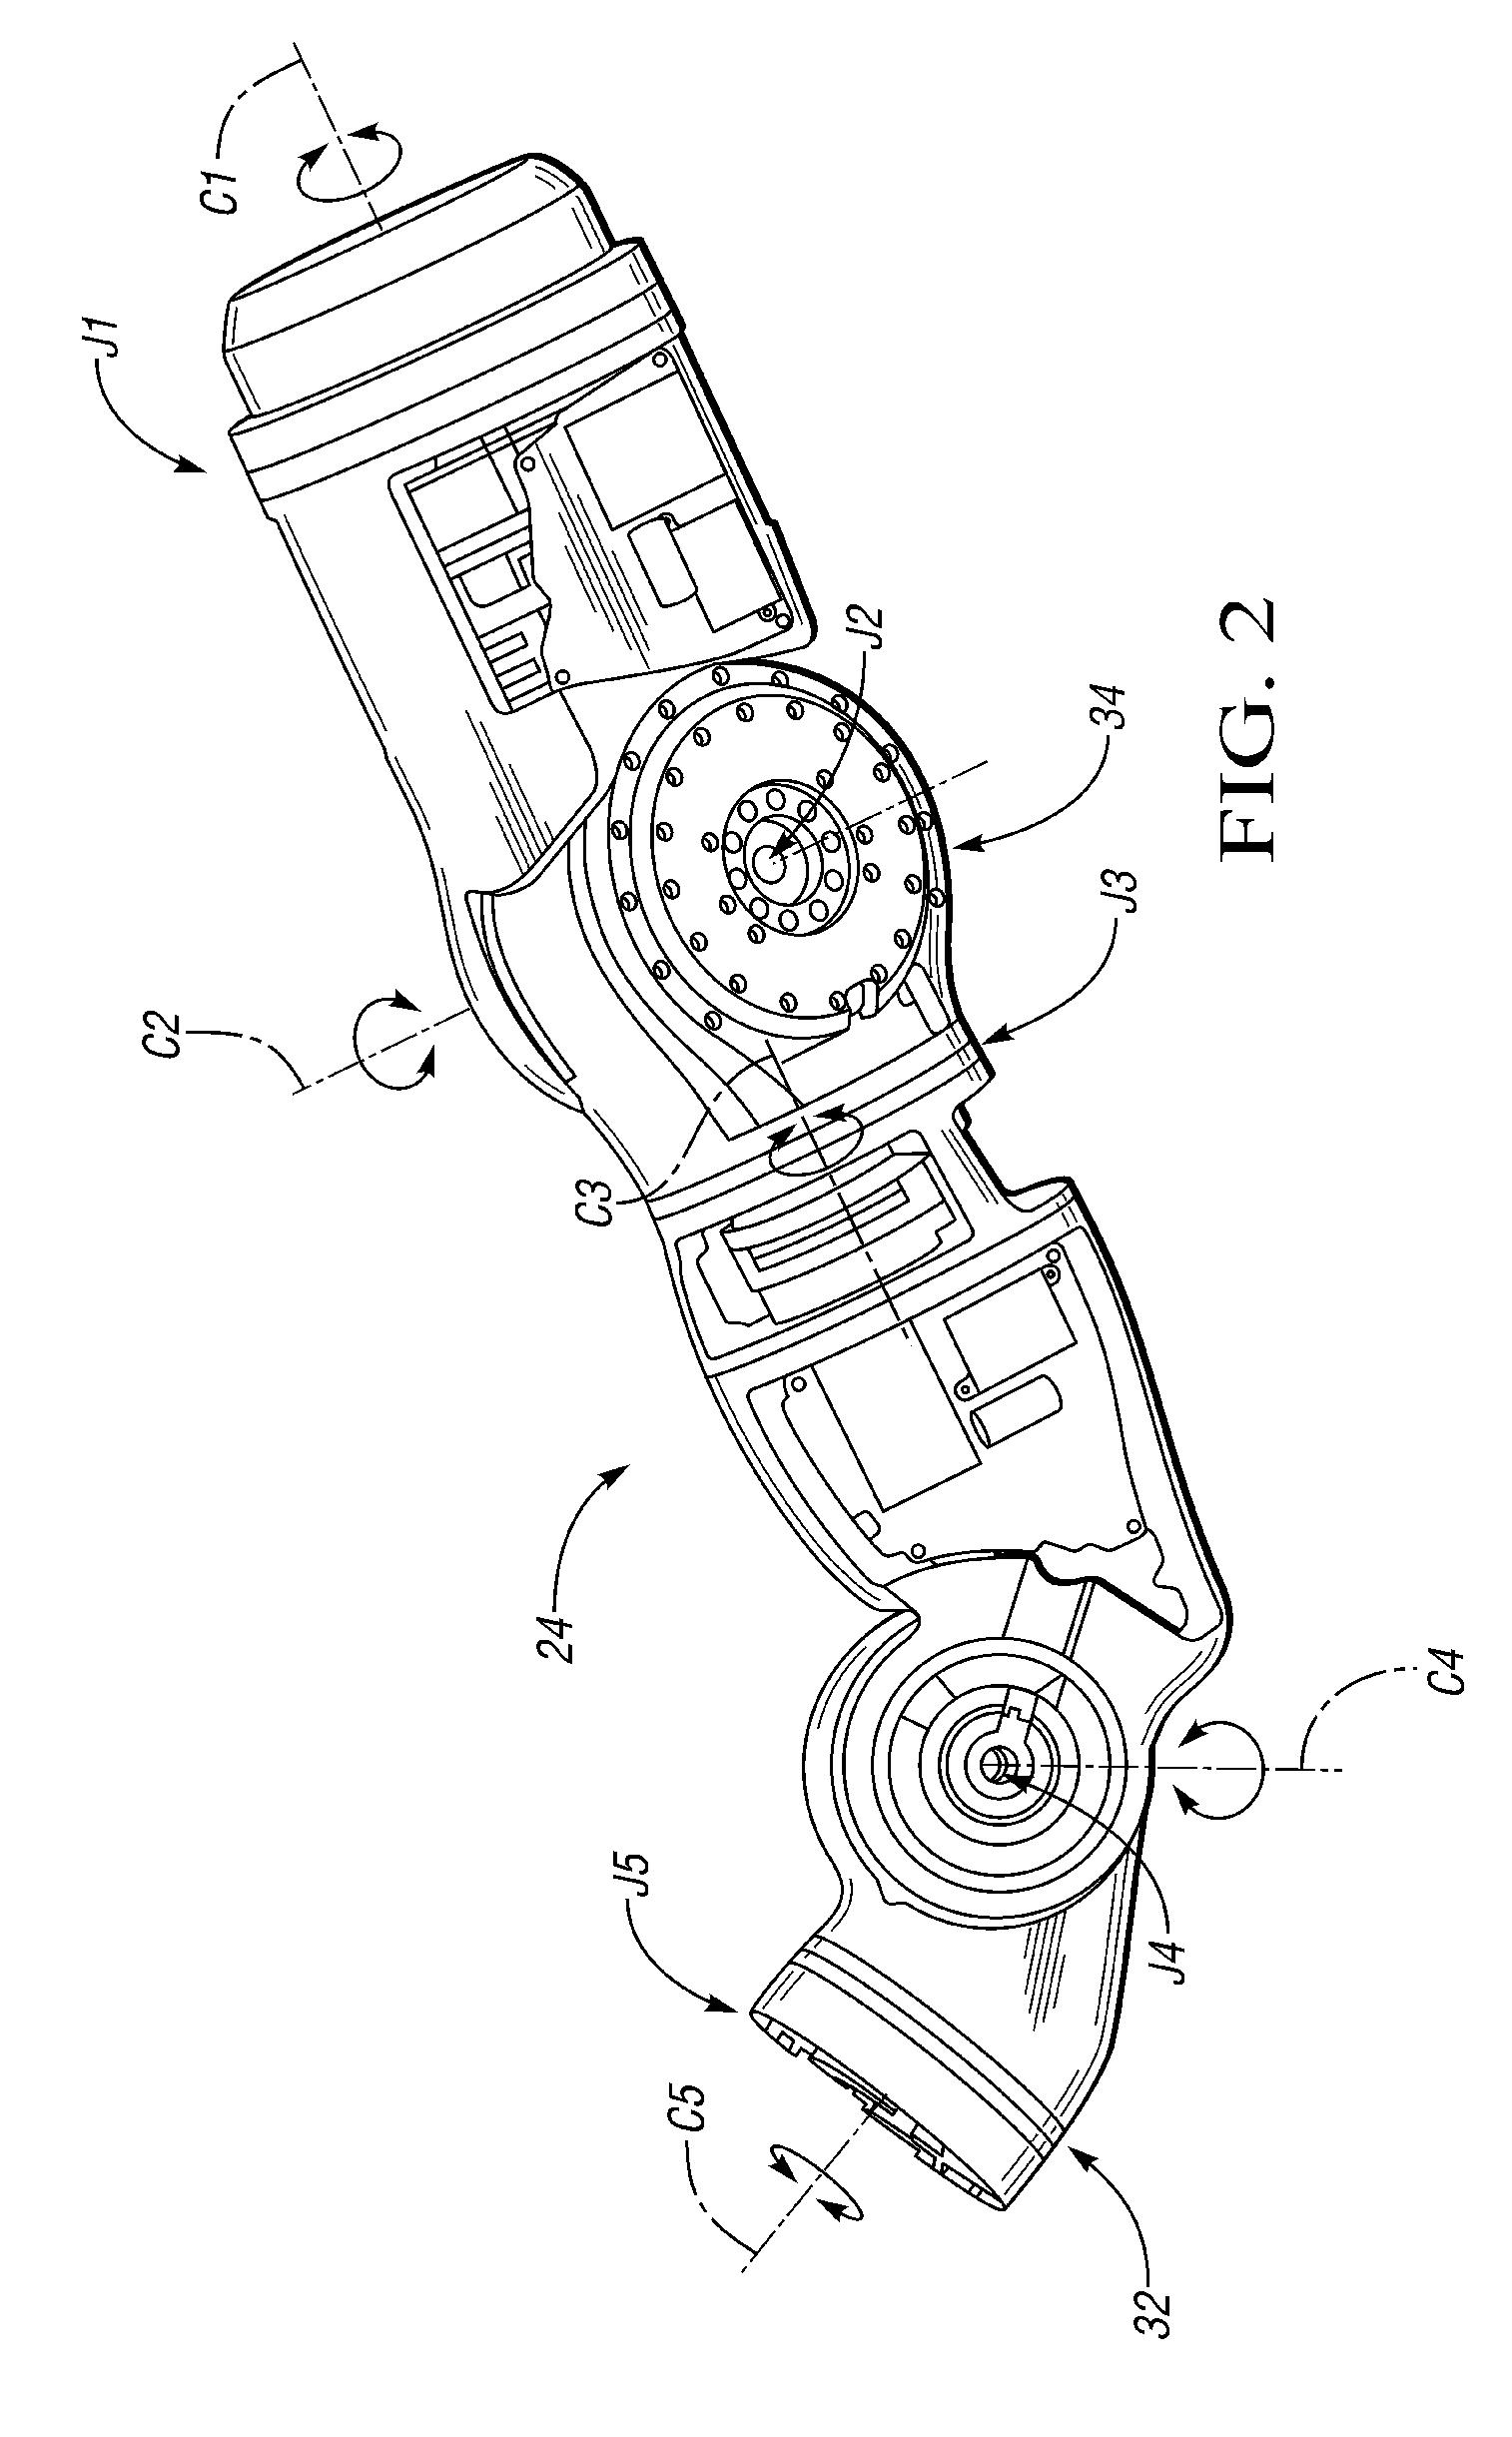 1514x2440 Patent Us8511964 Humanoid Robot Google Patents Drawing ~ Wiring